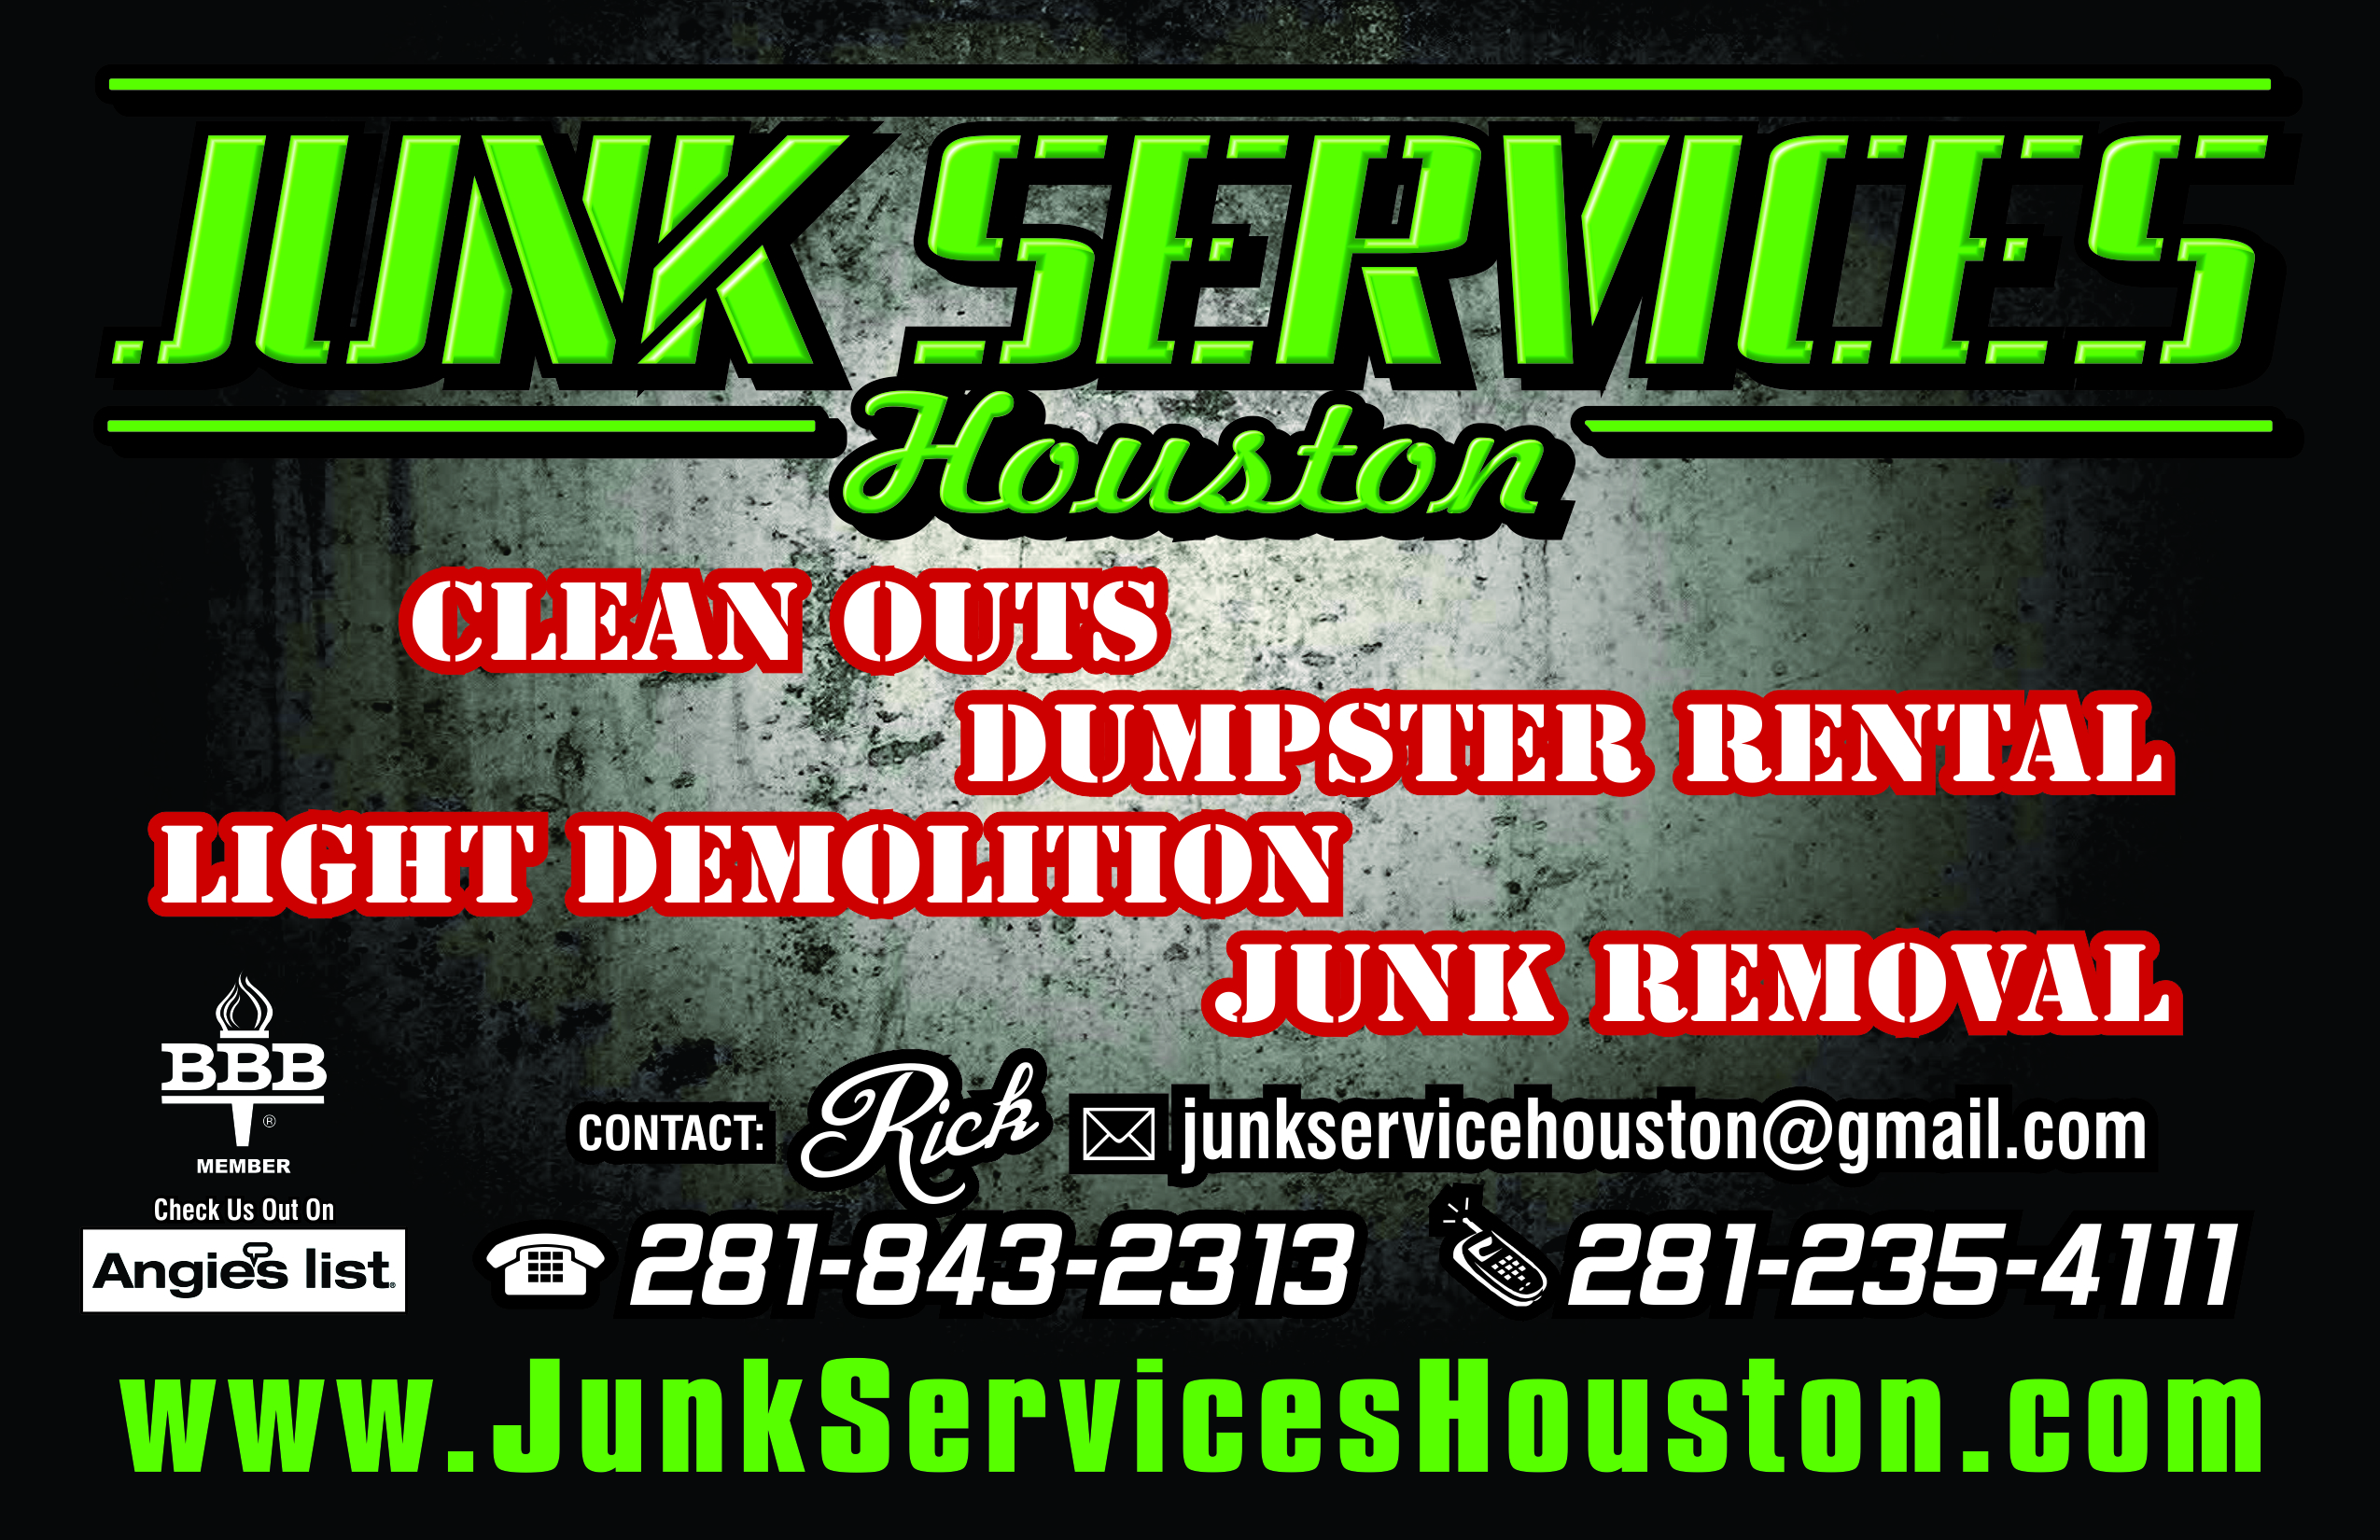 junk-services-flyer